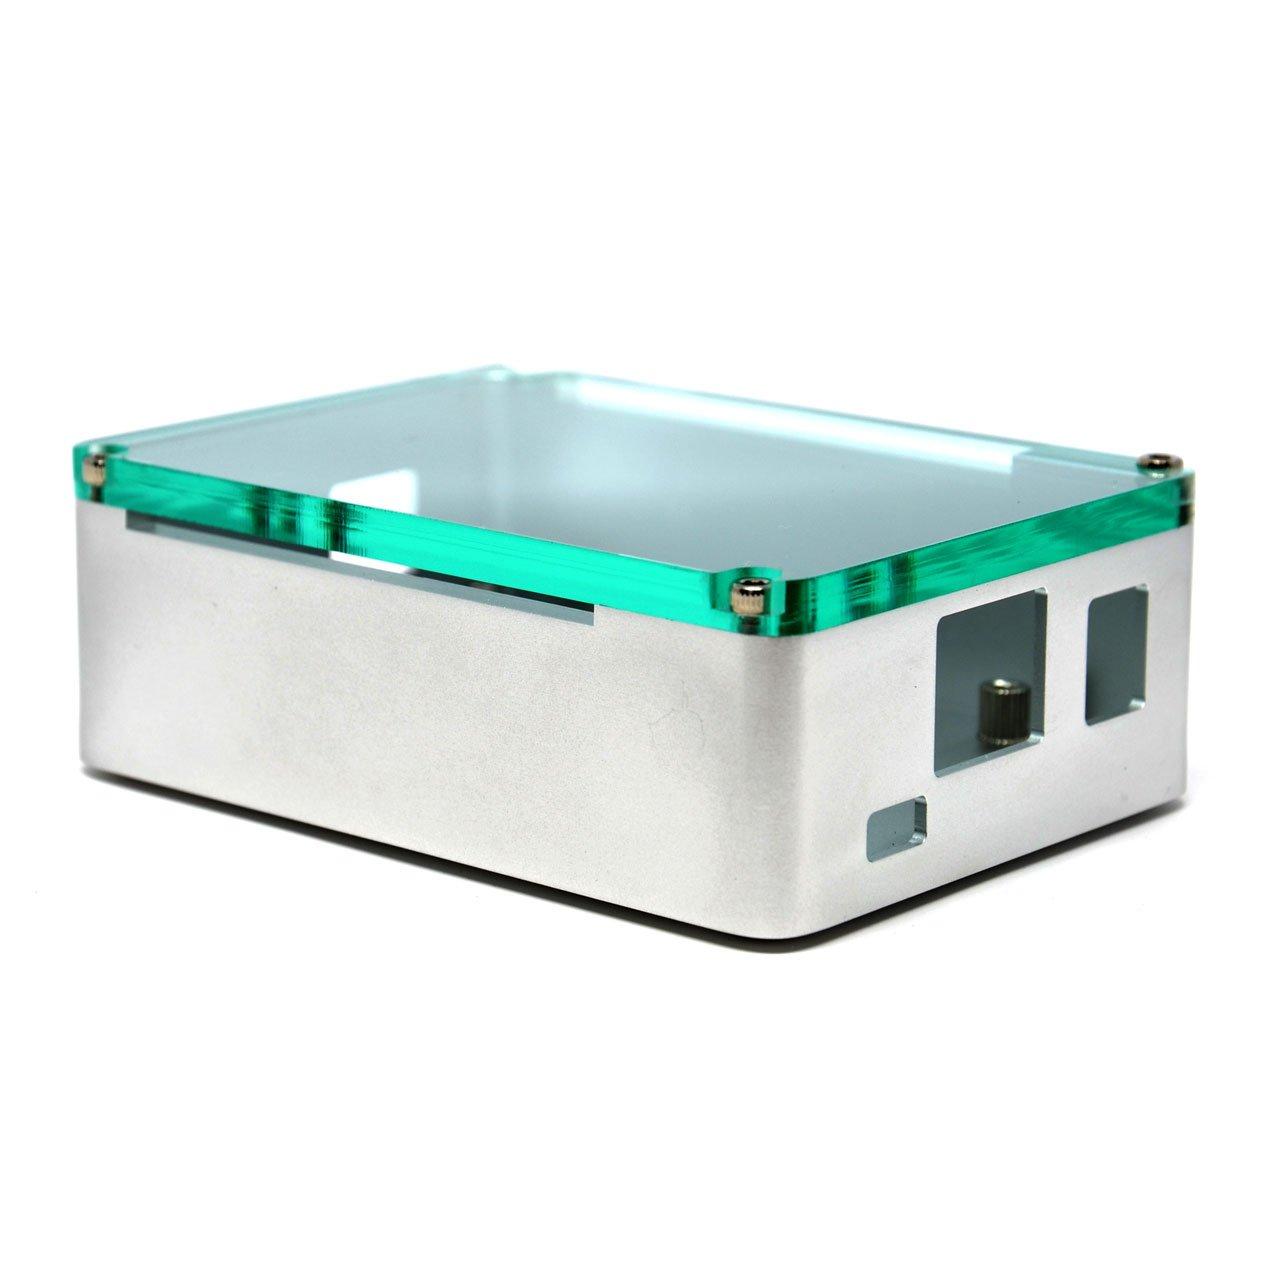 anidees AI-BBB-SG BeagleBone Black Aluminium Case with Acrylic top lid -Silver